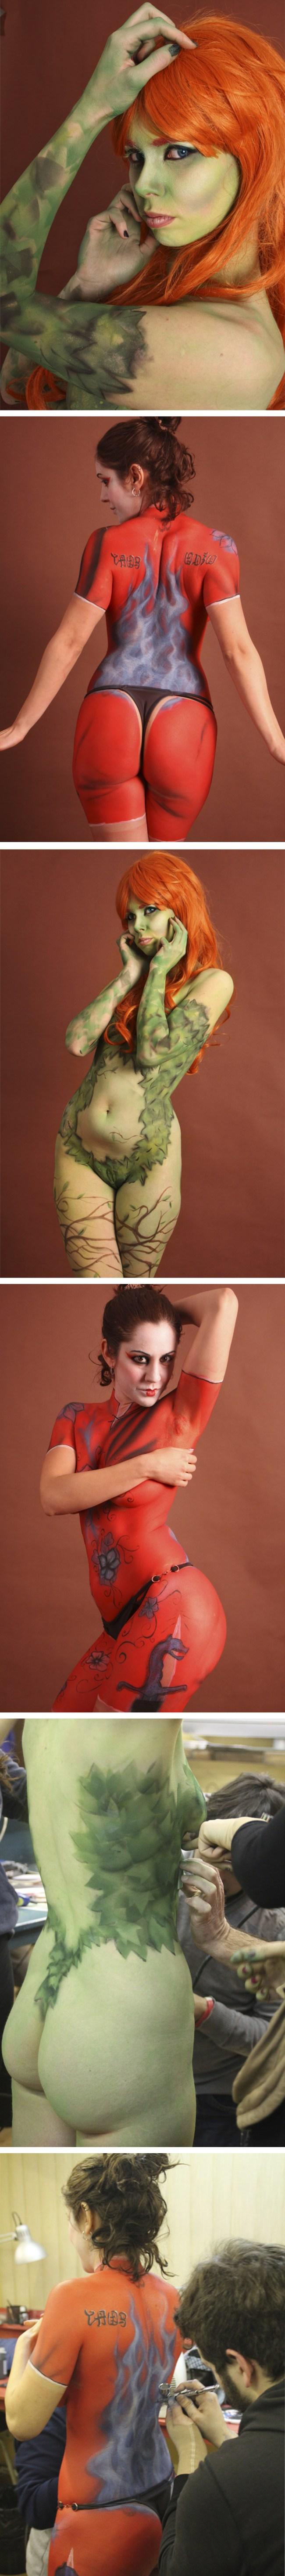 body_Paint_5Febrero